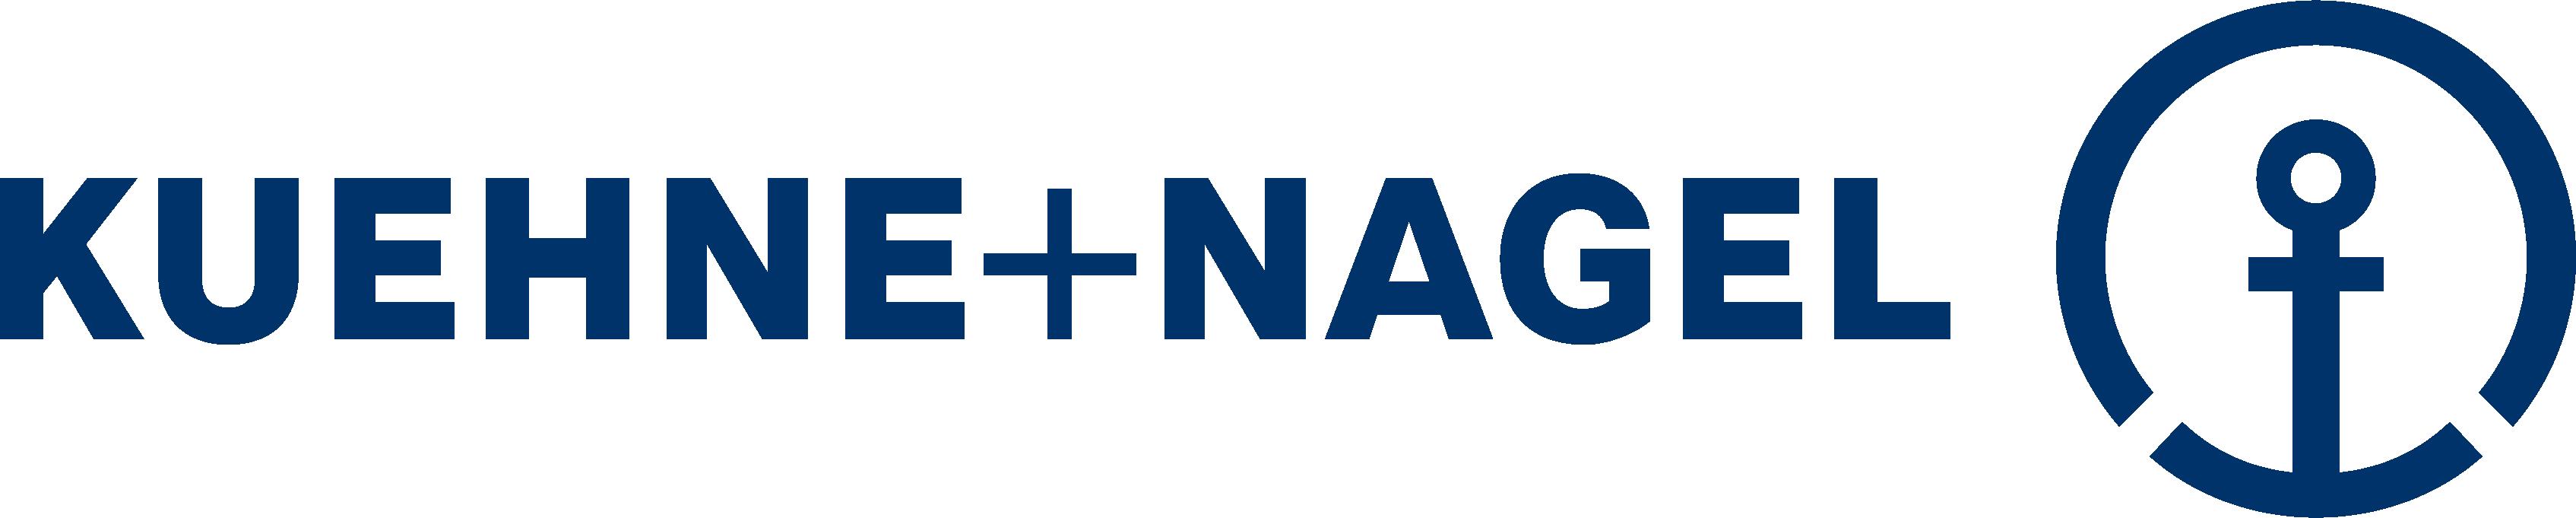 Logo de Kuehne Nagel